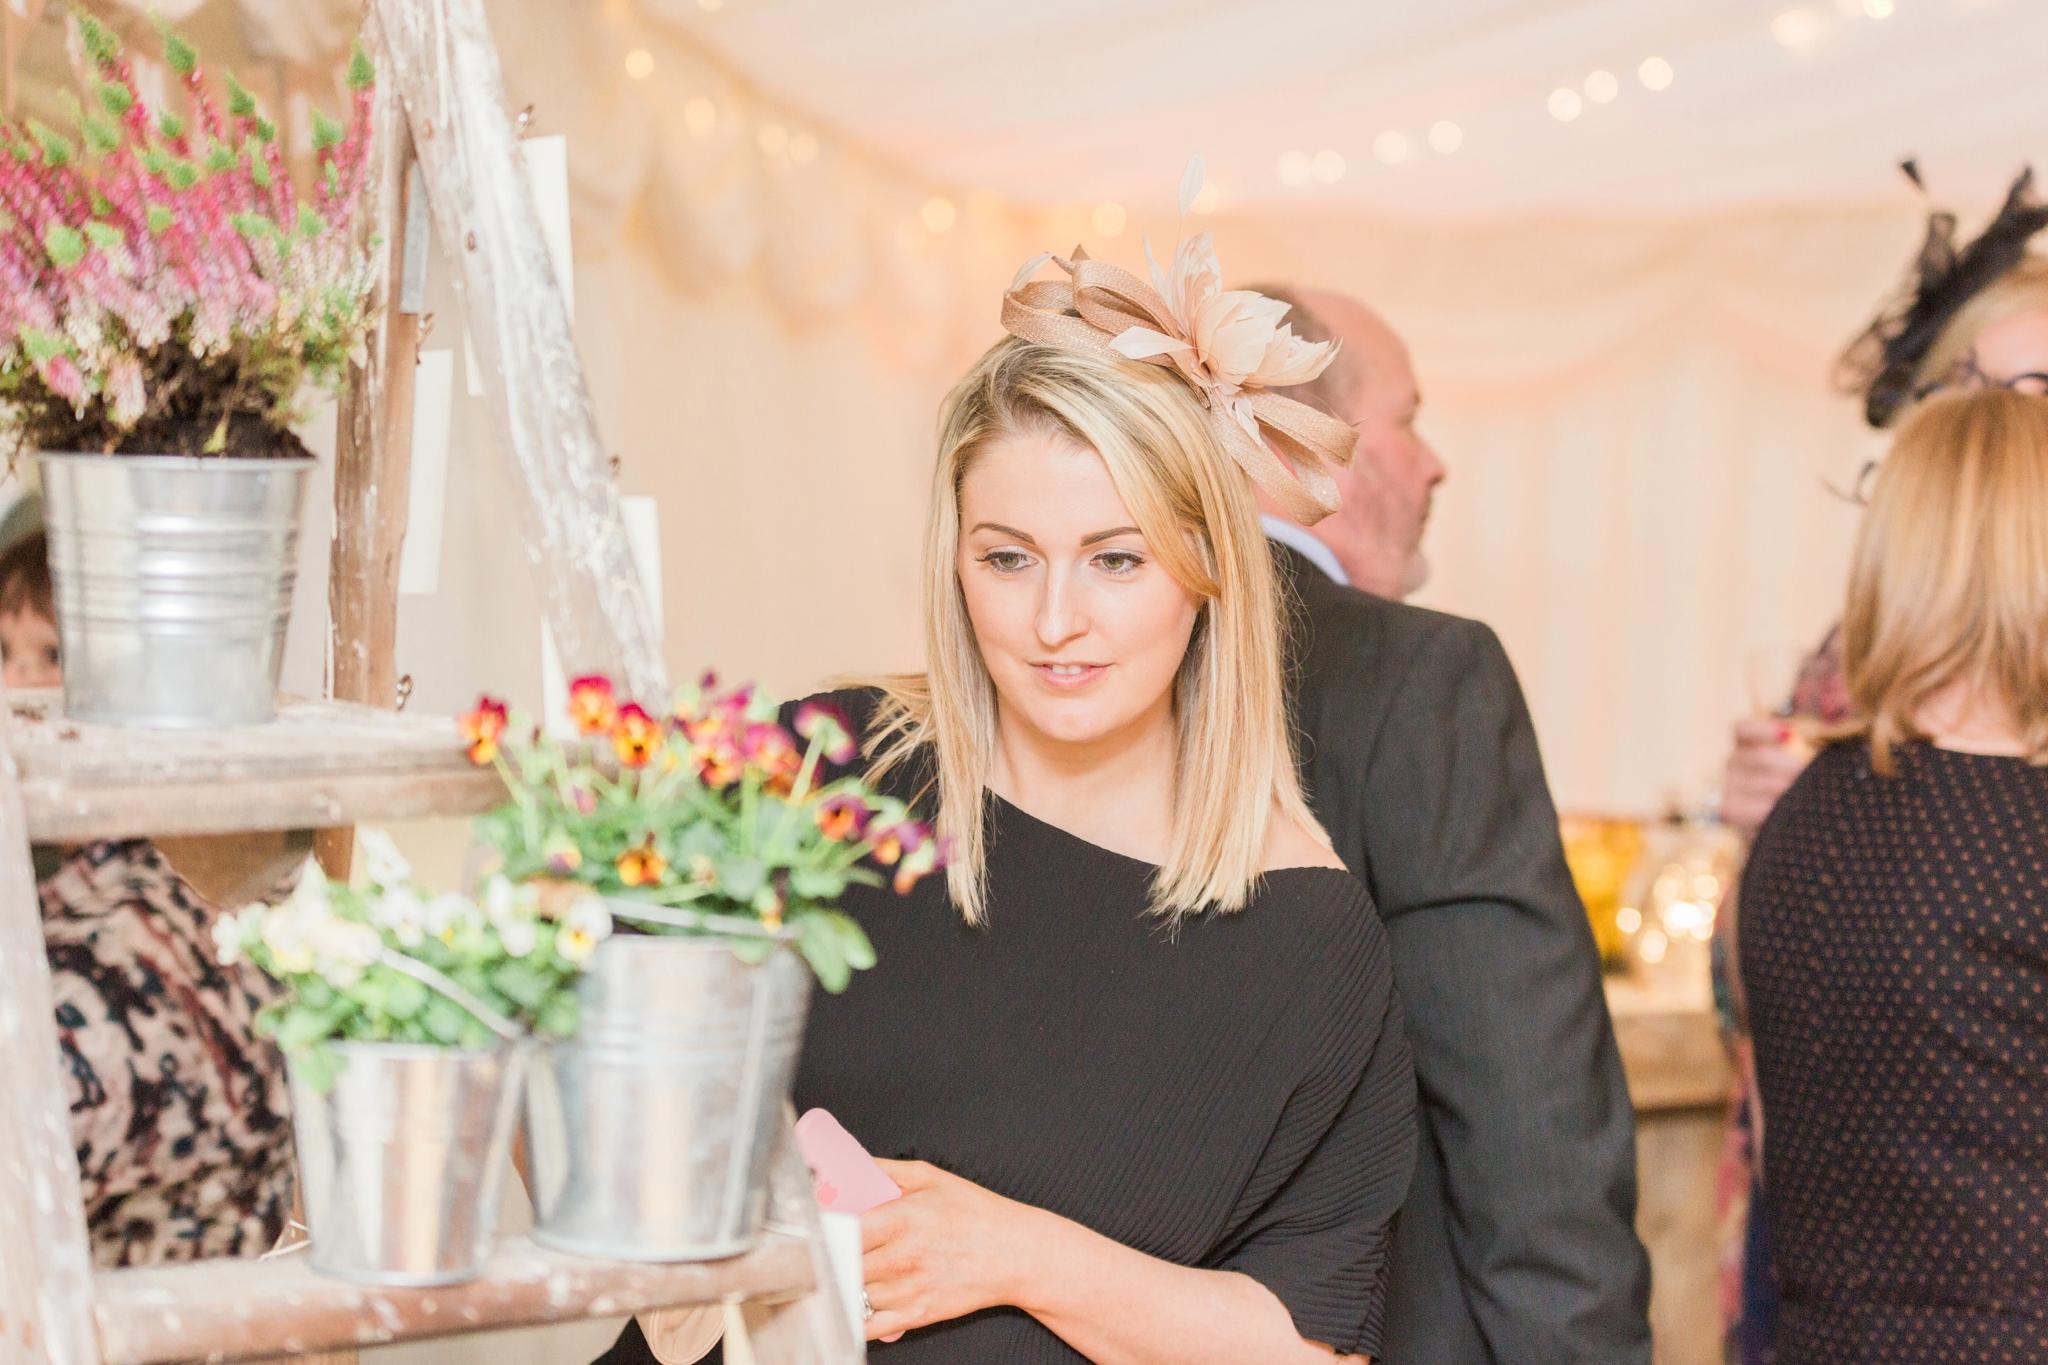 Suzanne_li_photography_kirknewton_wedding_0051.jpg